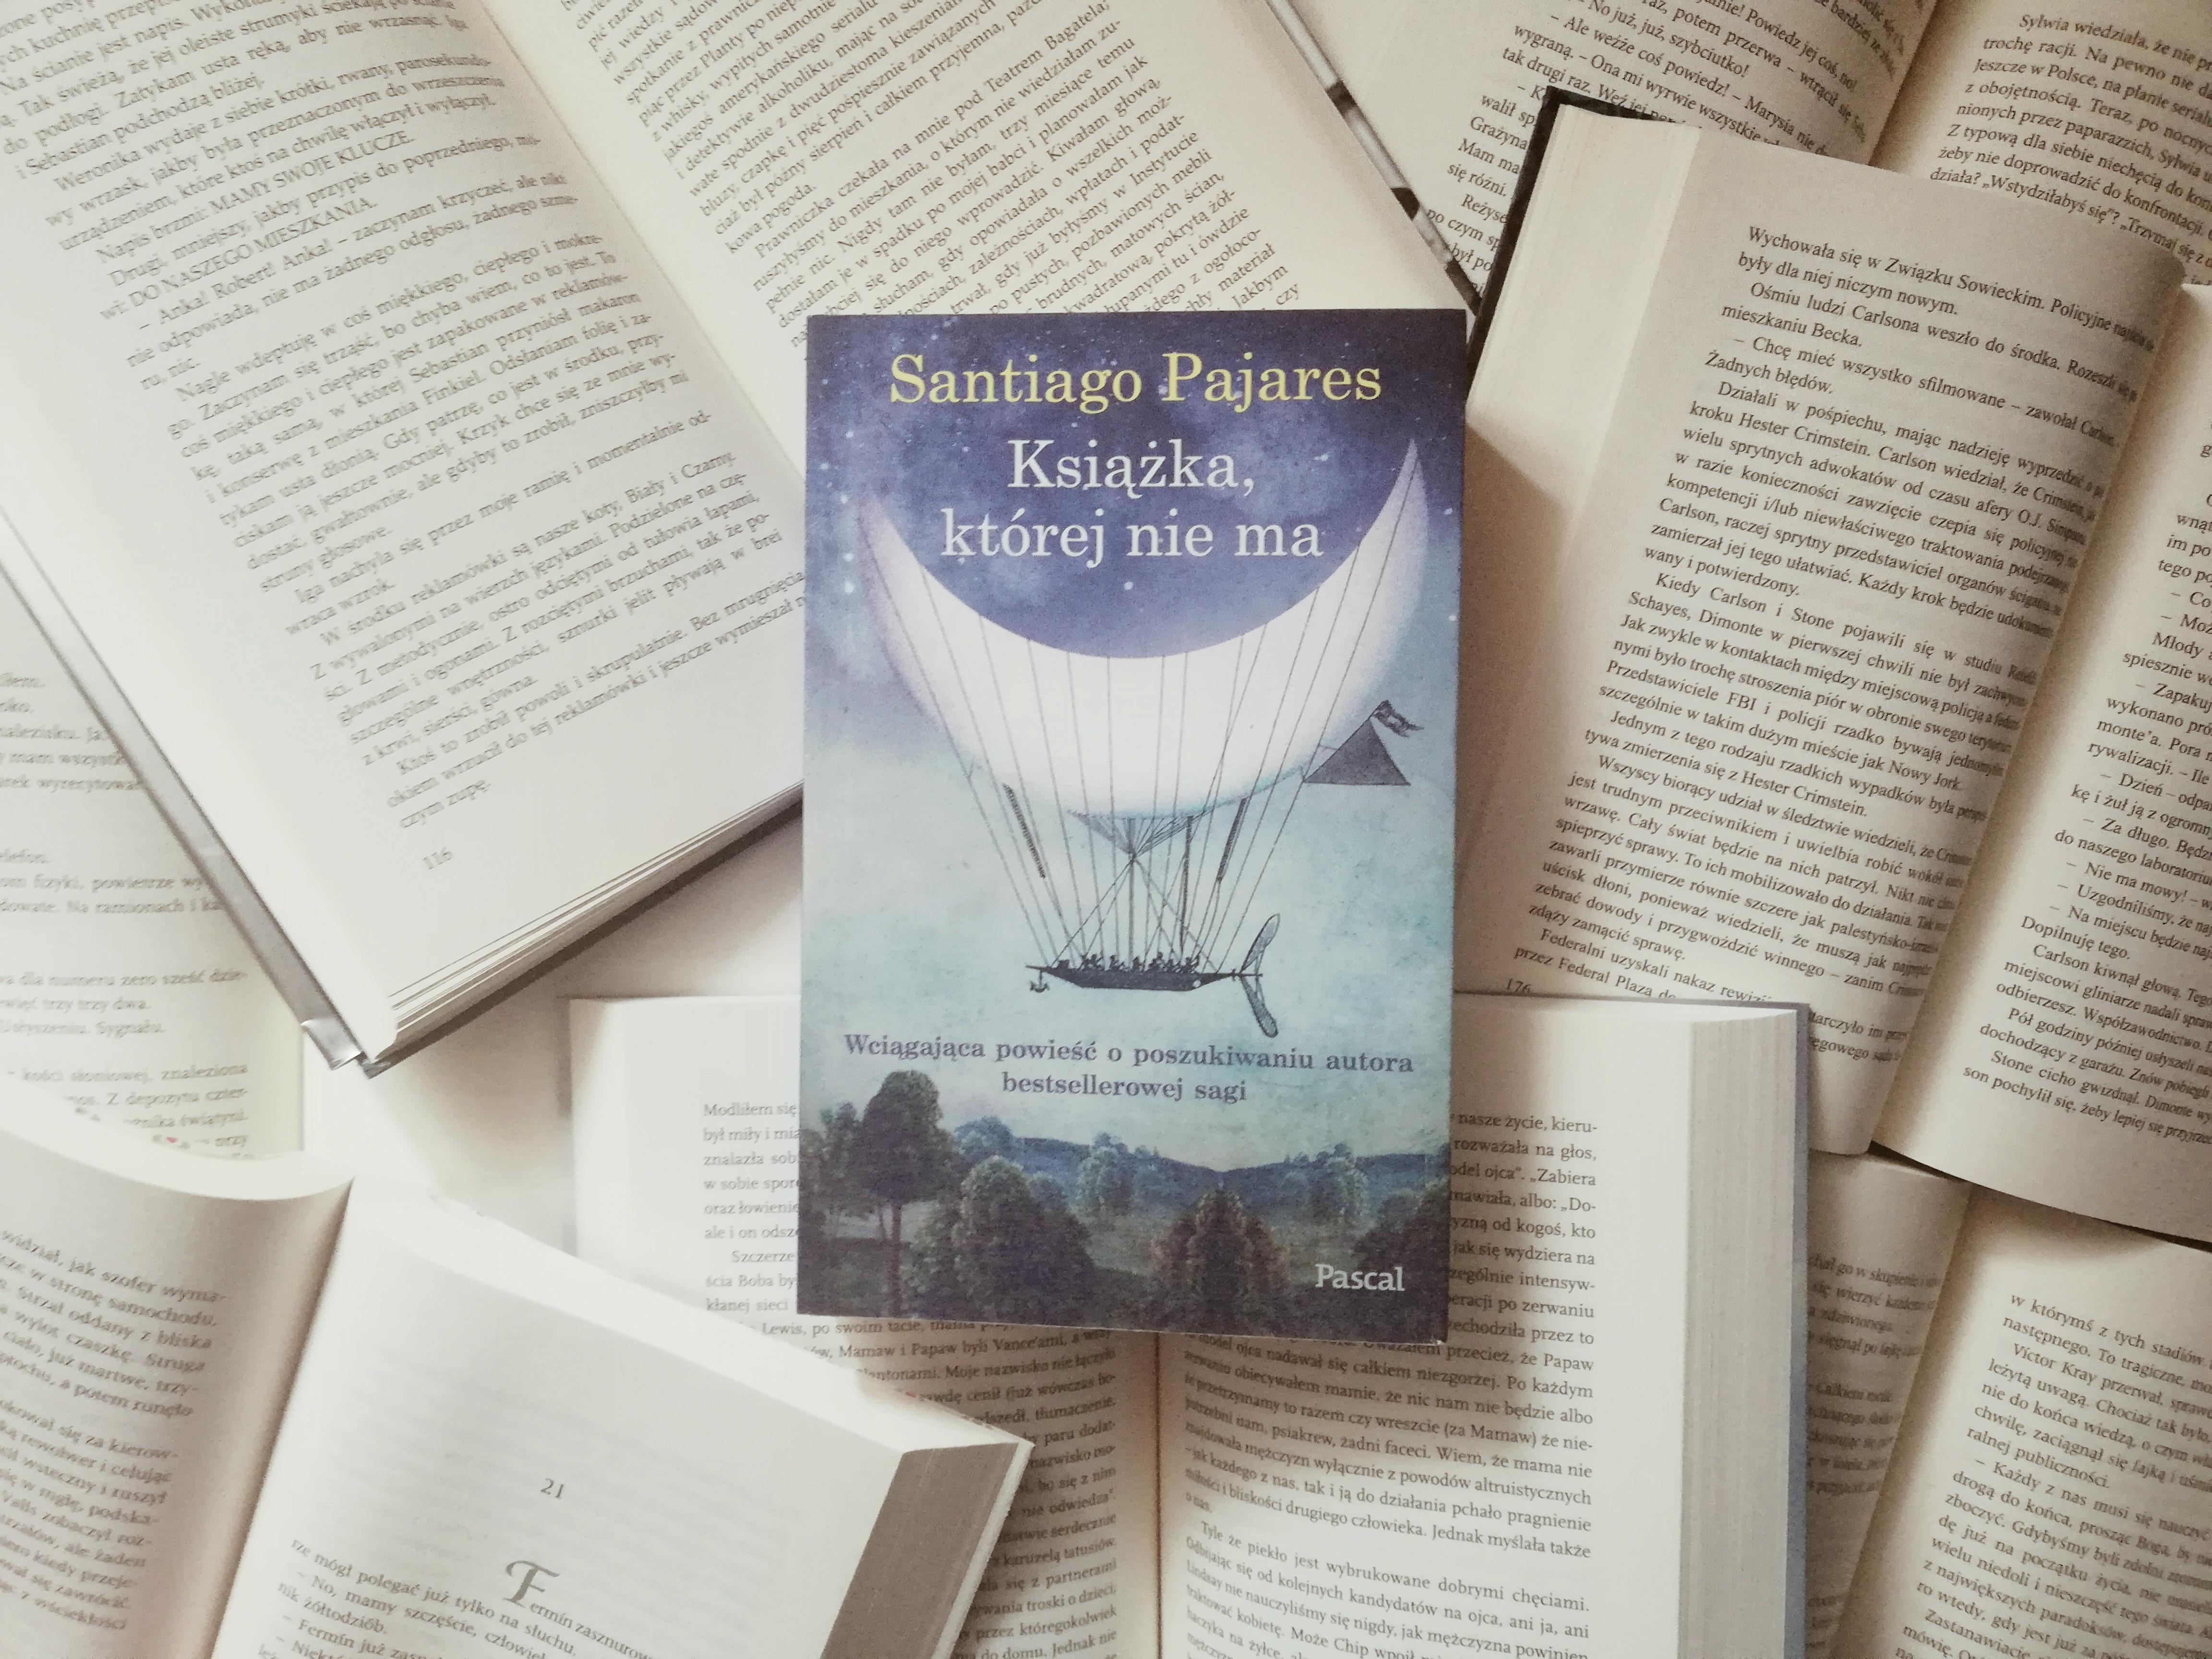 książka której nie ma